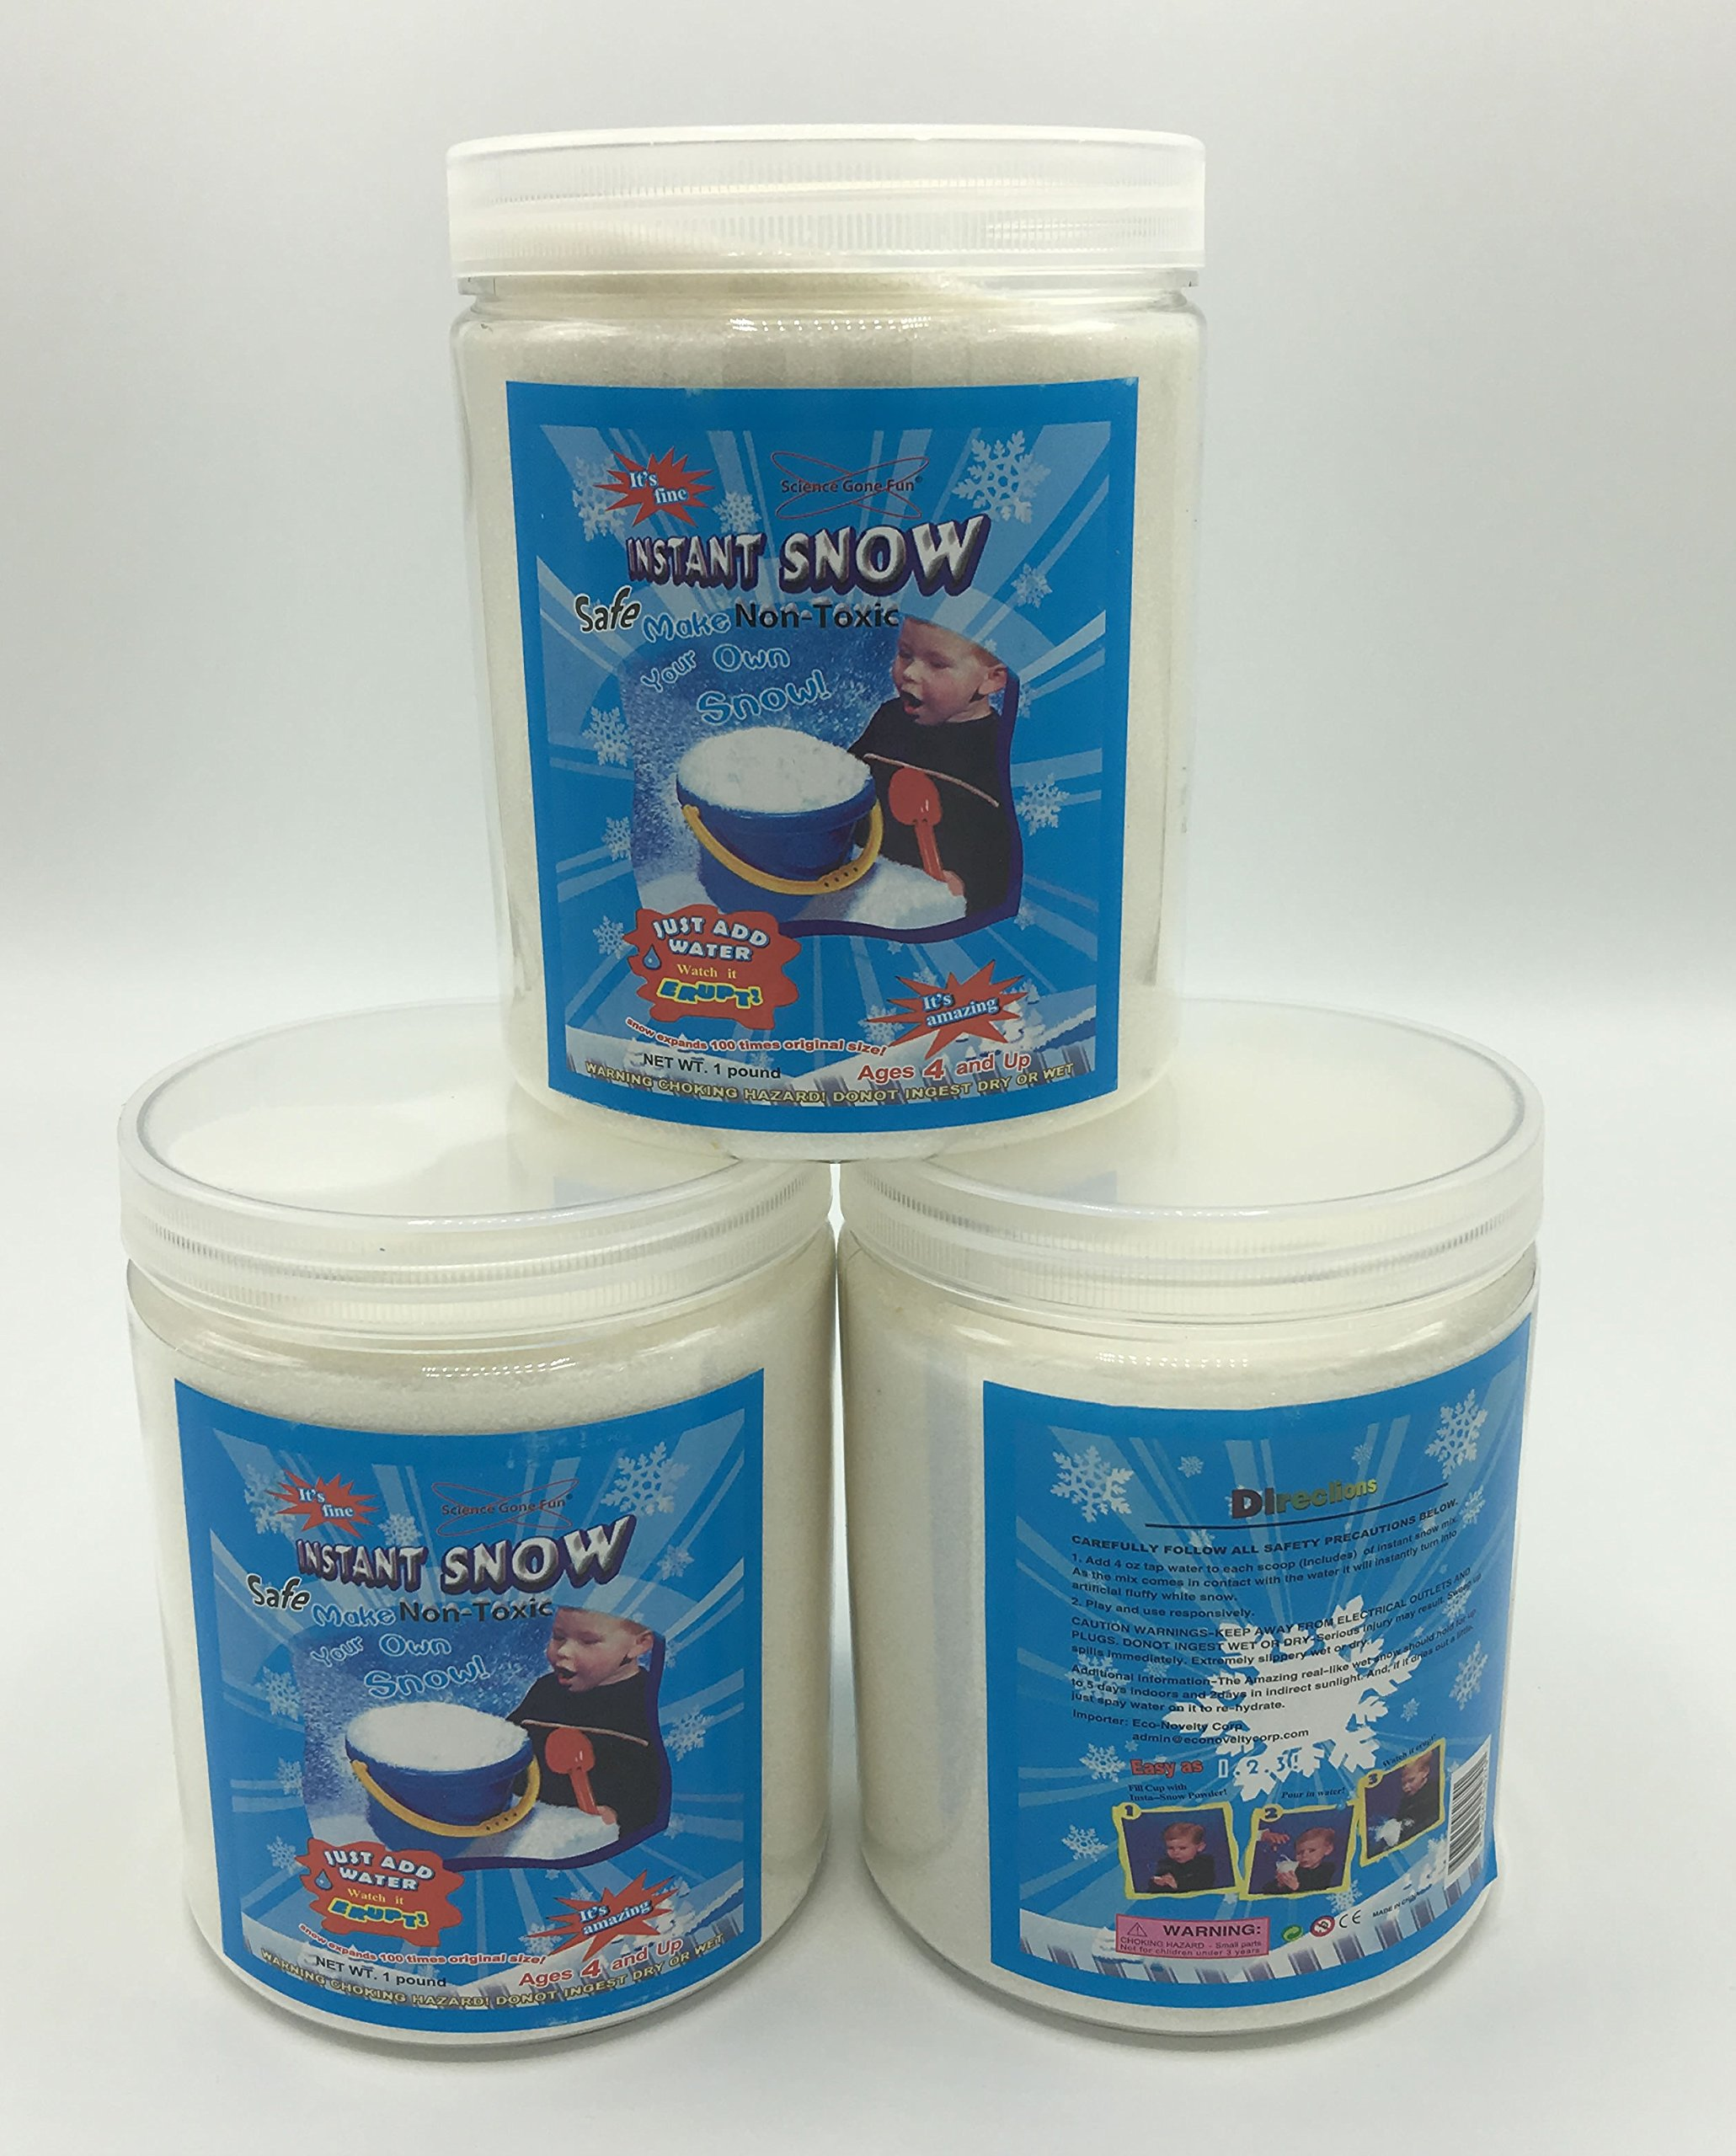 Magic Instant Expanding Snow Powder 1 Pound Jar (3), Makes 24 Gallons